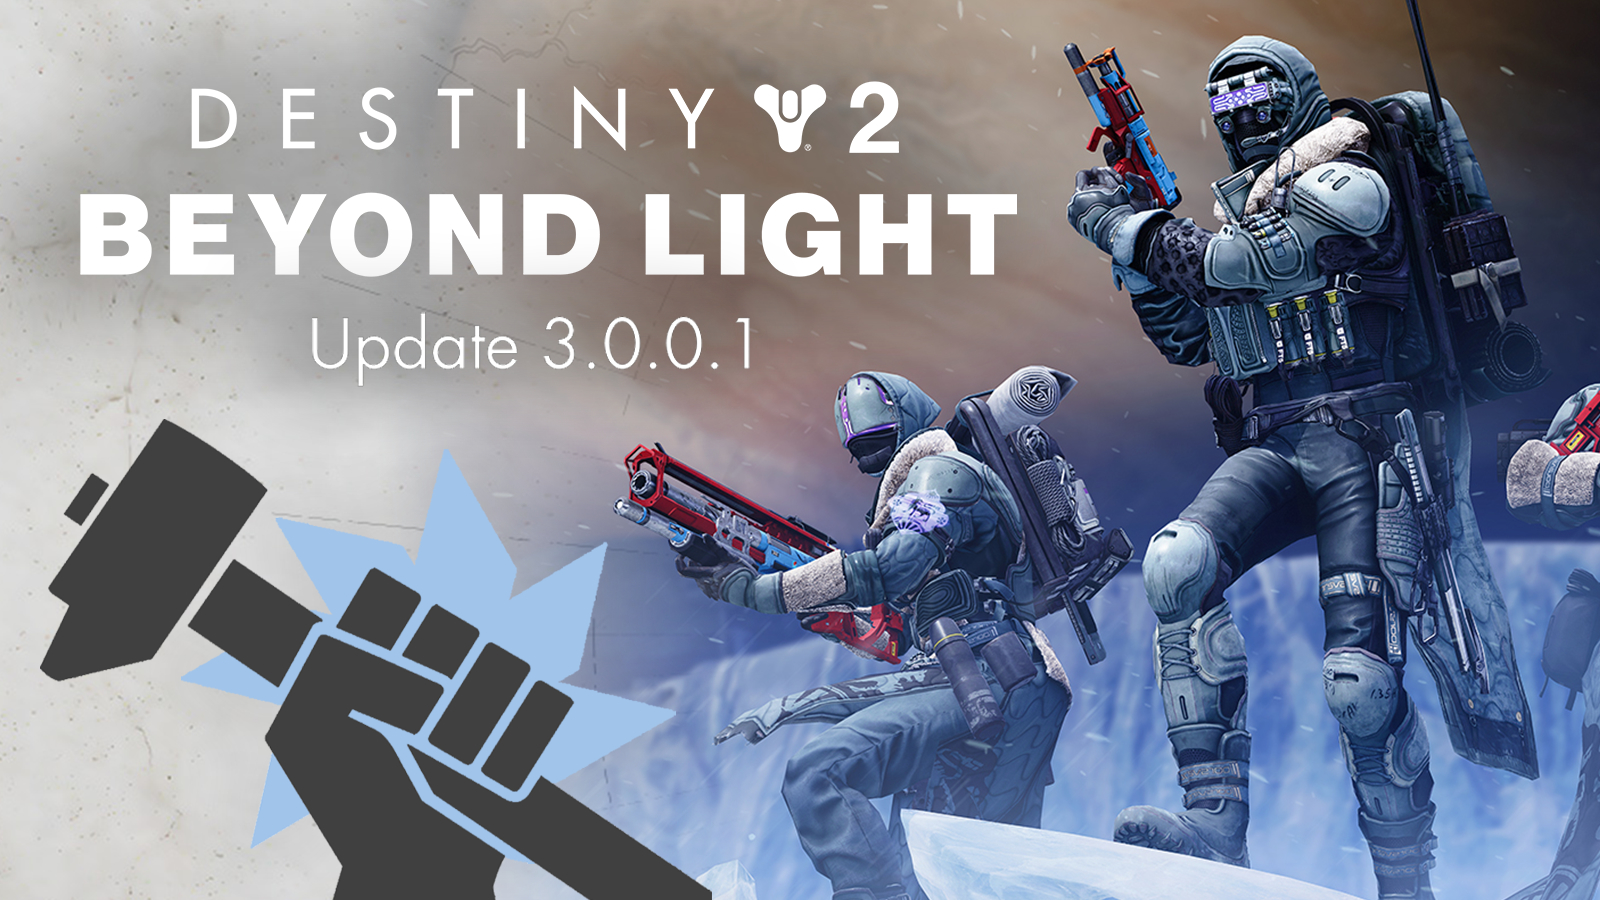 Destiny 2 Beyond Light update 3.0.0.1 patch notes on Guardian image.